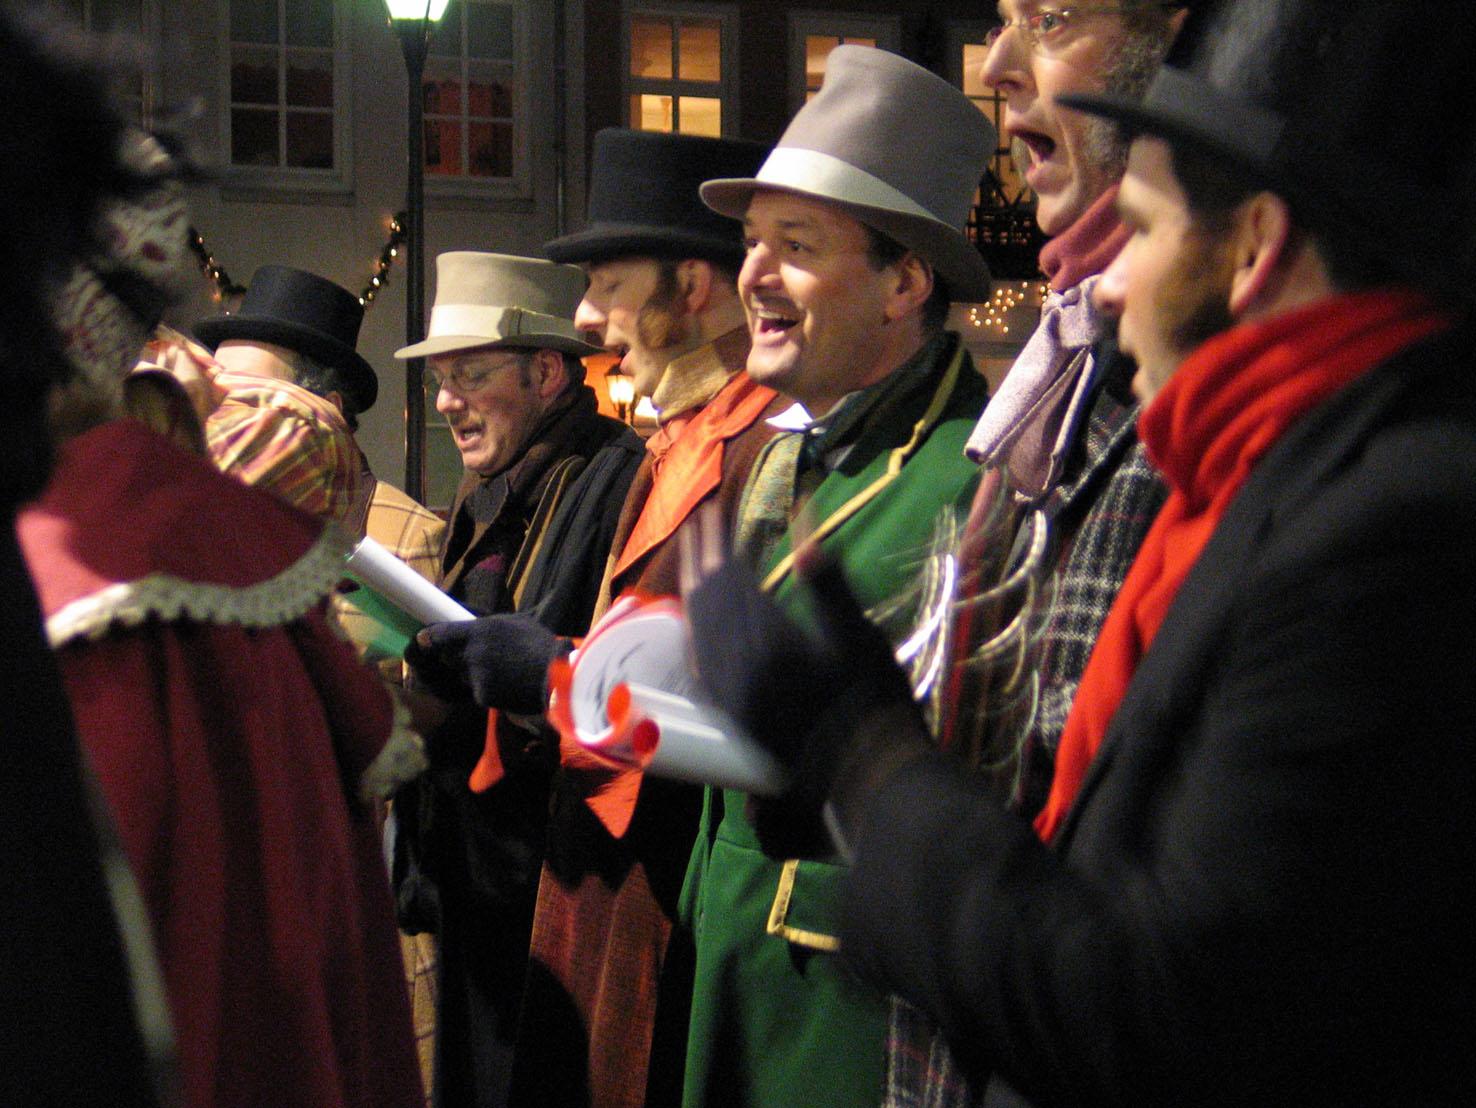 161 - Kerstmarkt Helmond 2003.jpg